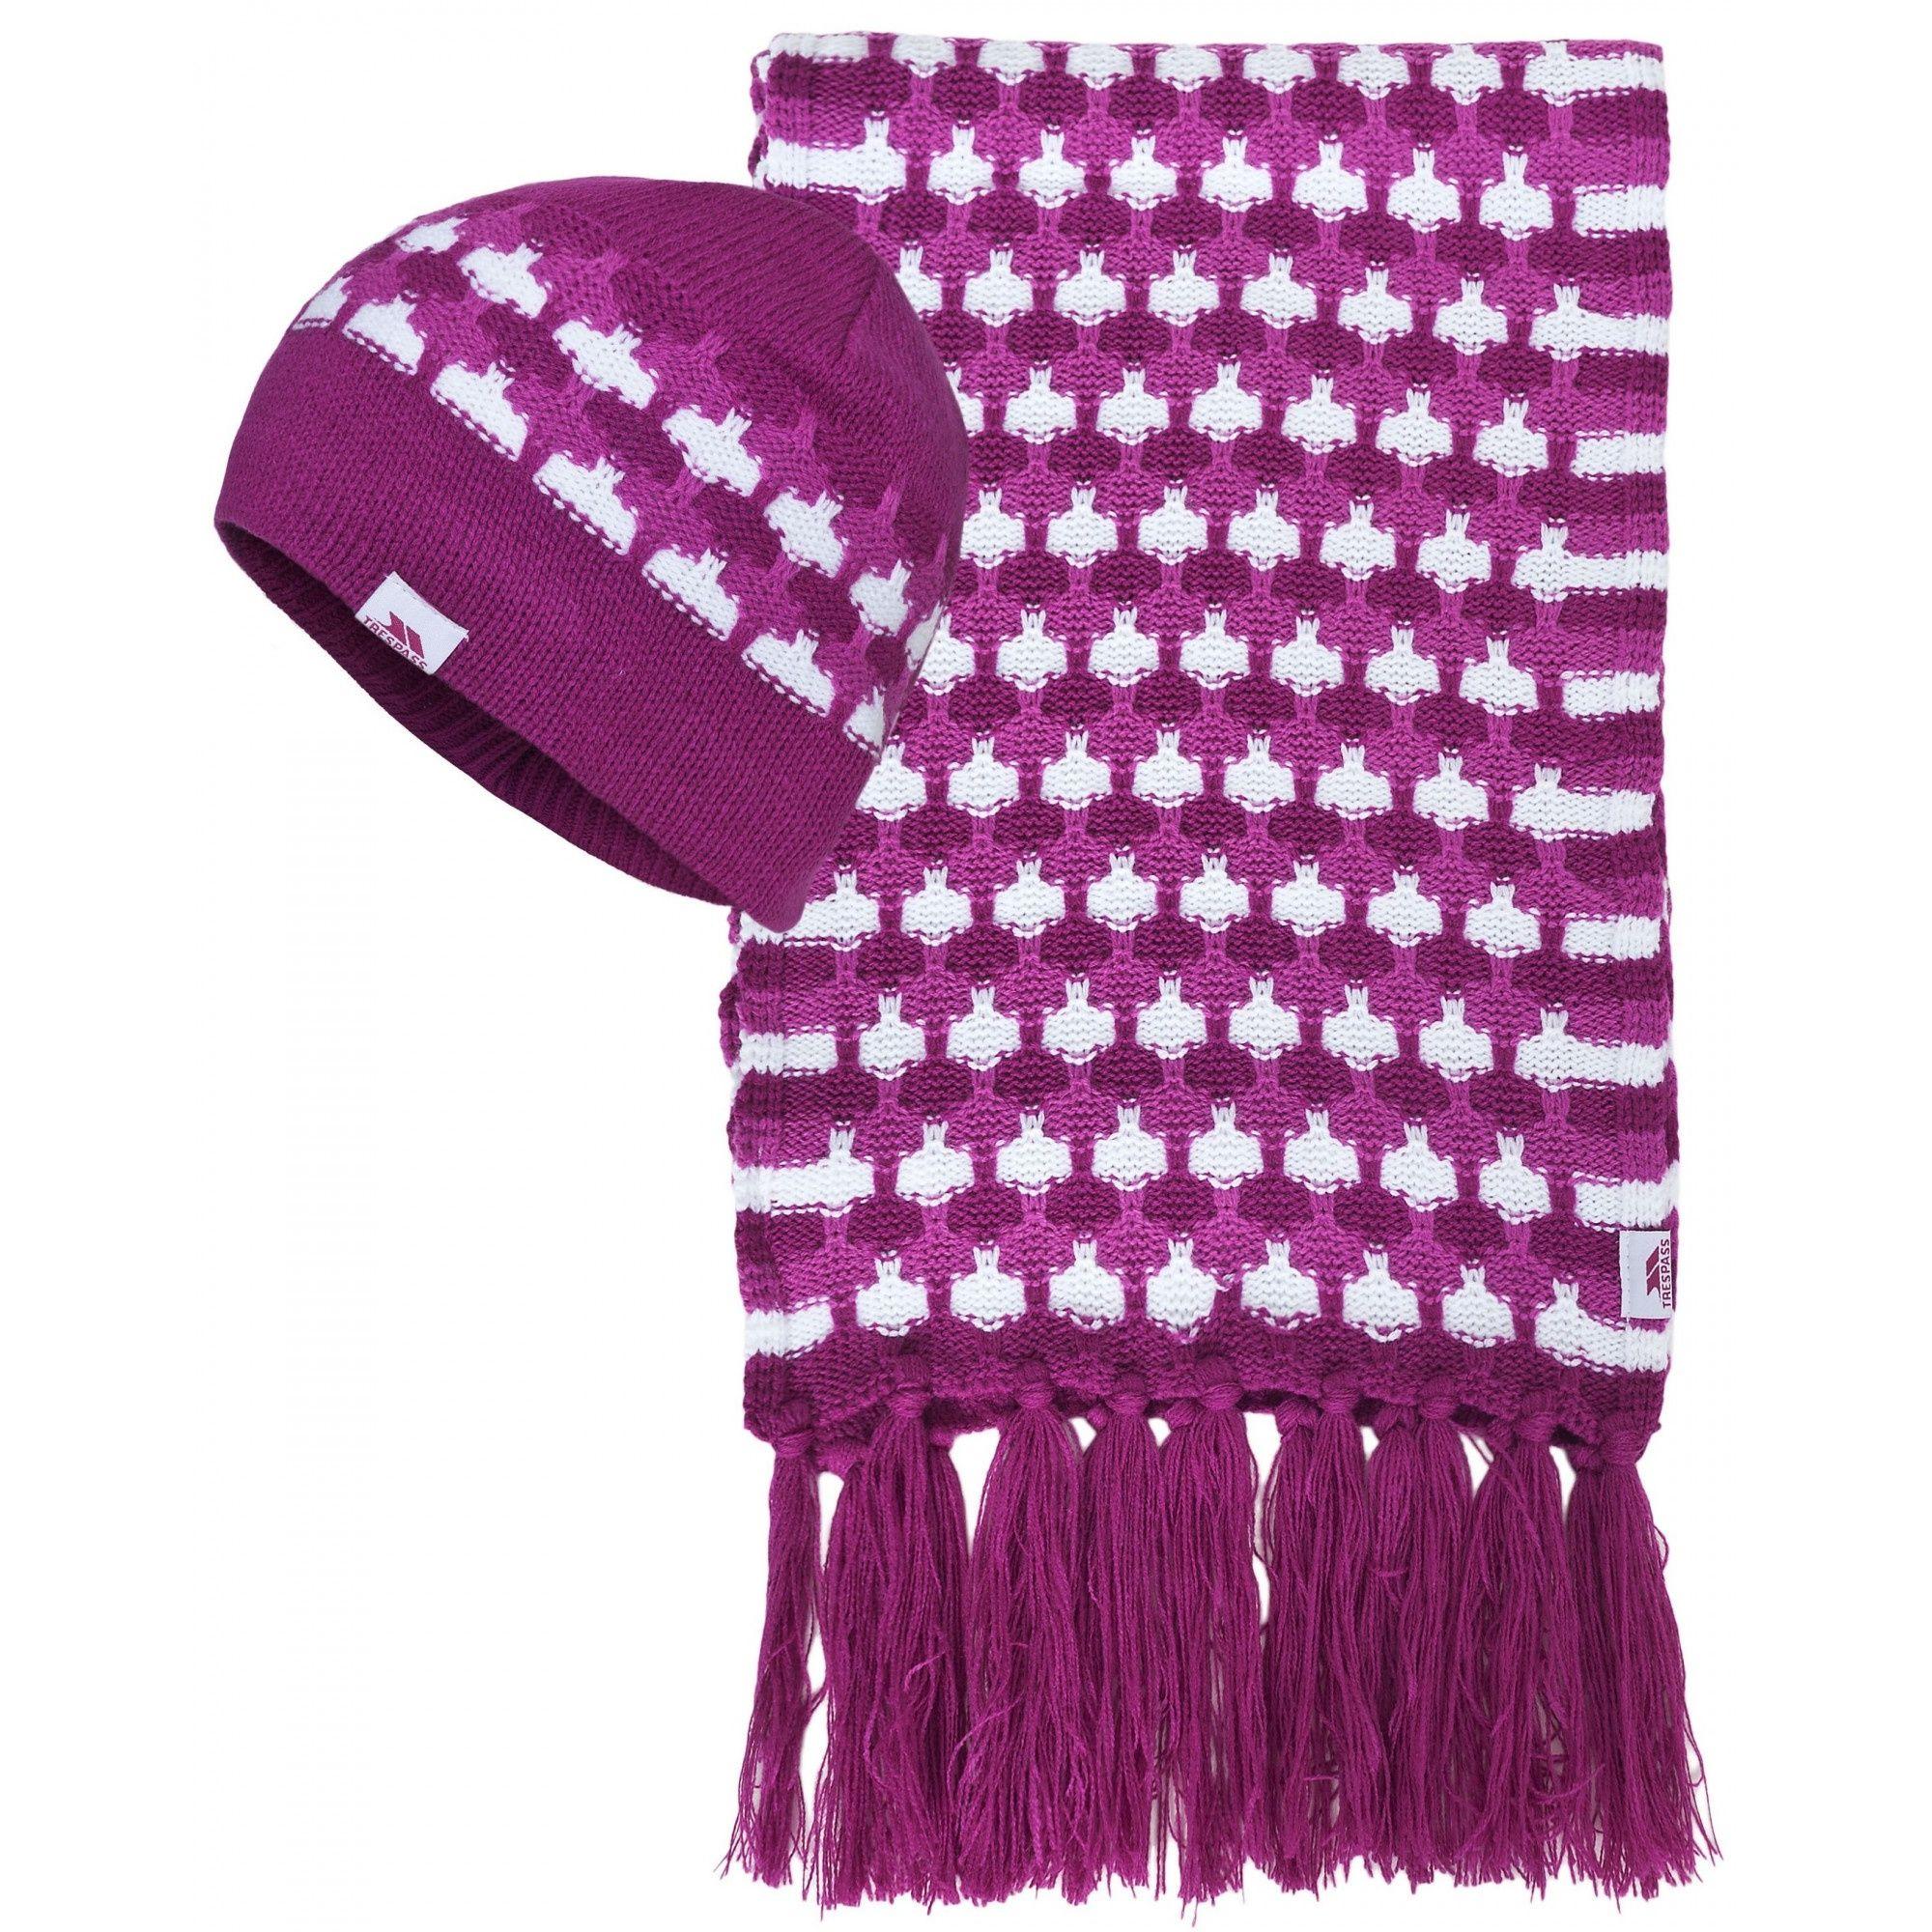 Trespass Womens/Ladies Bunty Winter Hat And Scarf Set